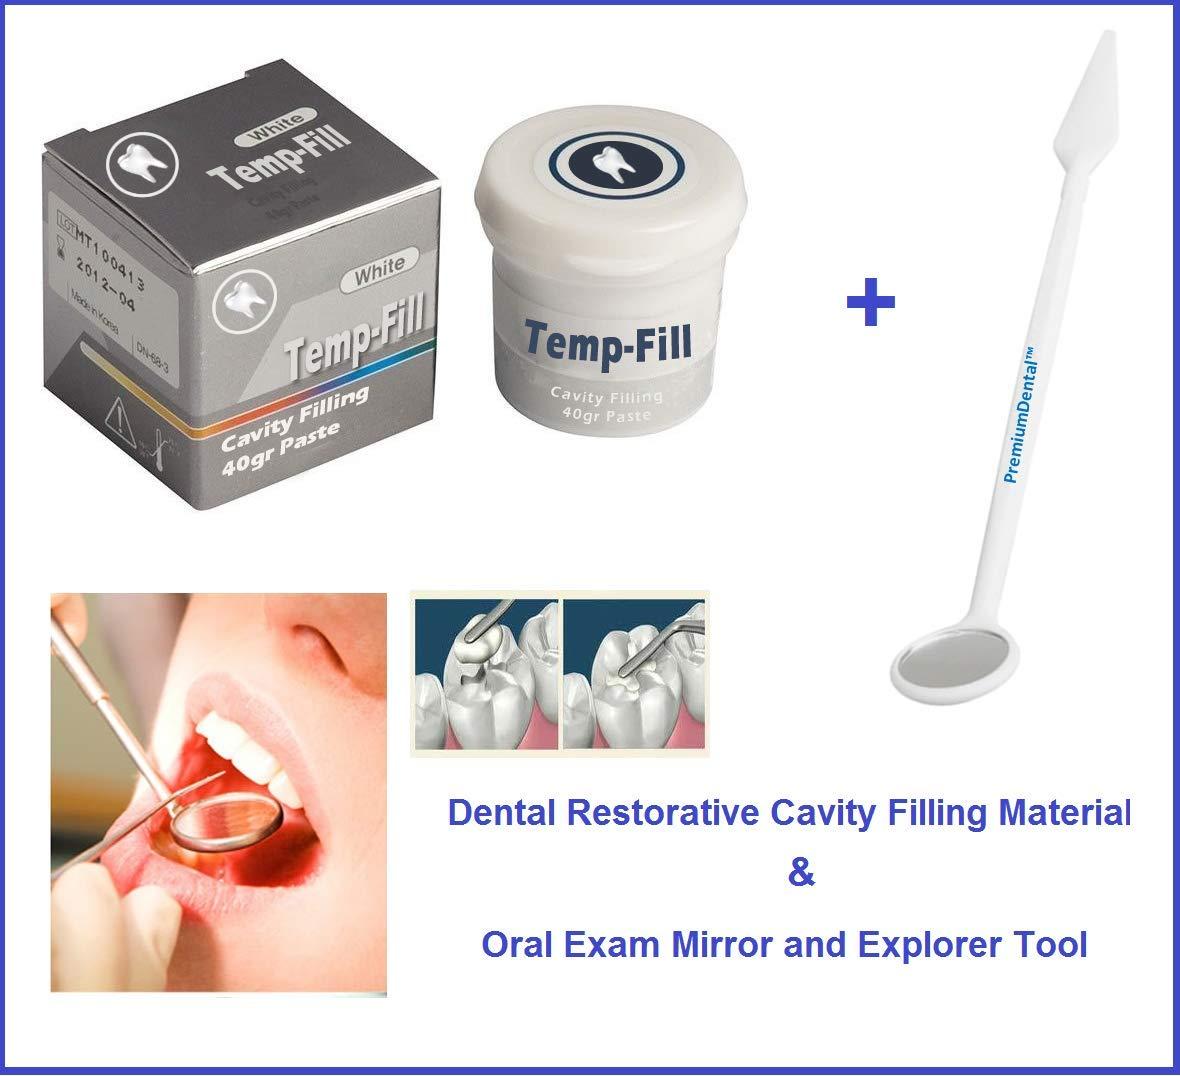 Dental Restorative Cavity Filling Material and Oral Examination Mirror Explorer Tool